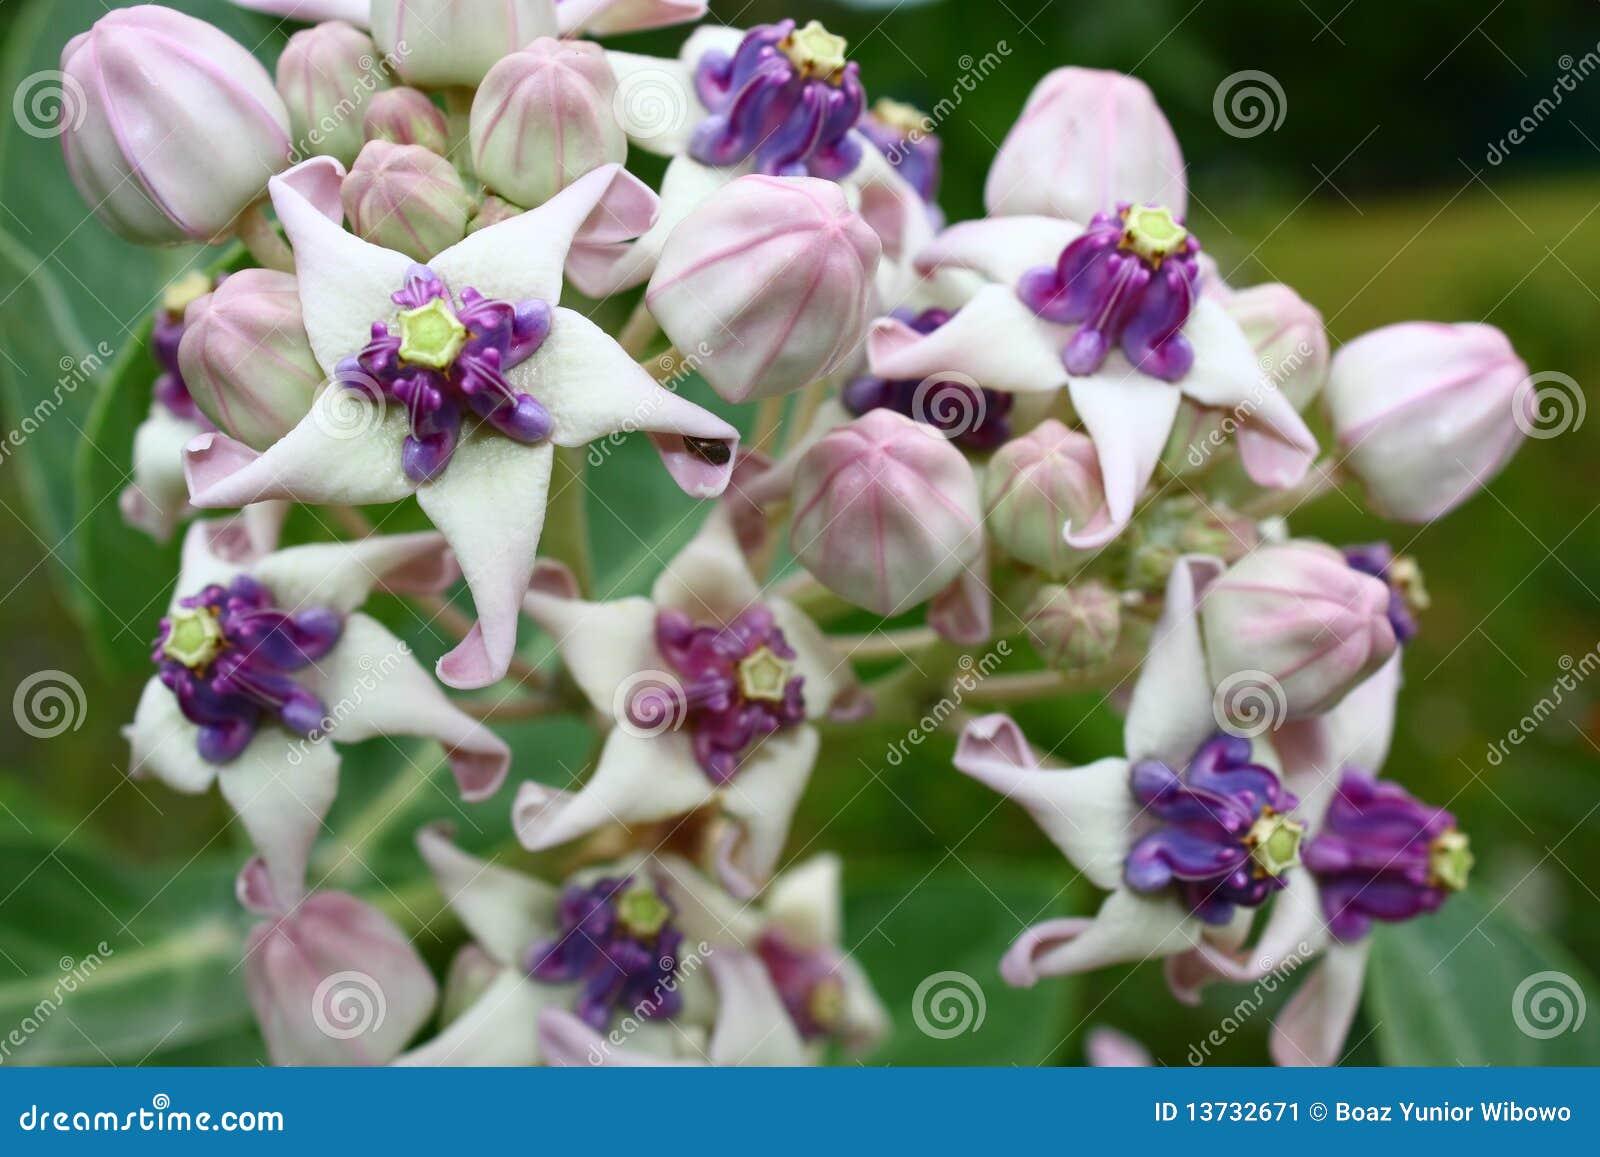 Crown Flower Calotropis Gigantea Stock Images 530 Photos